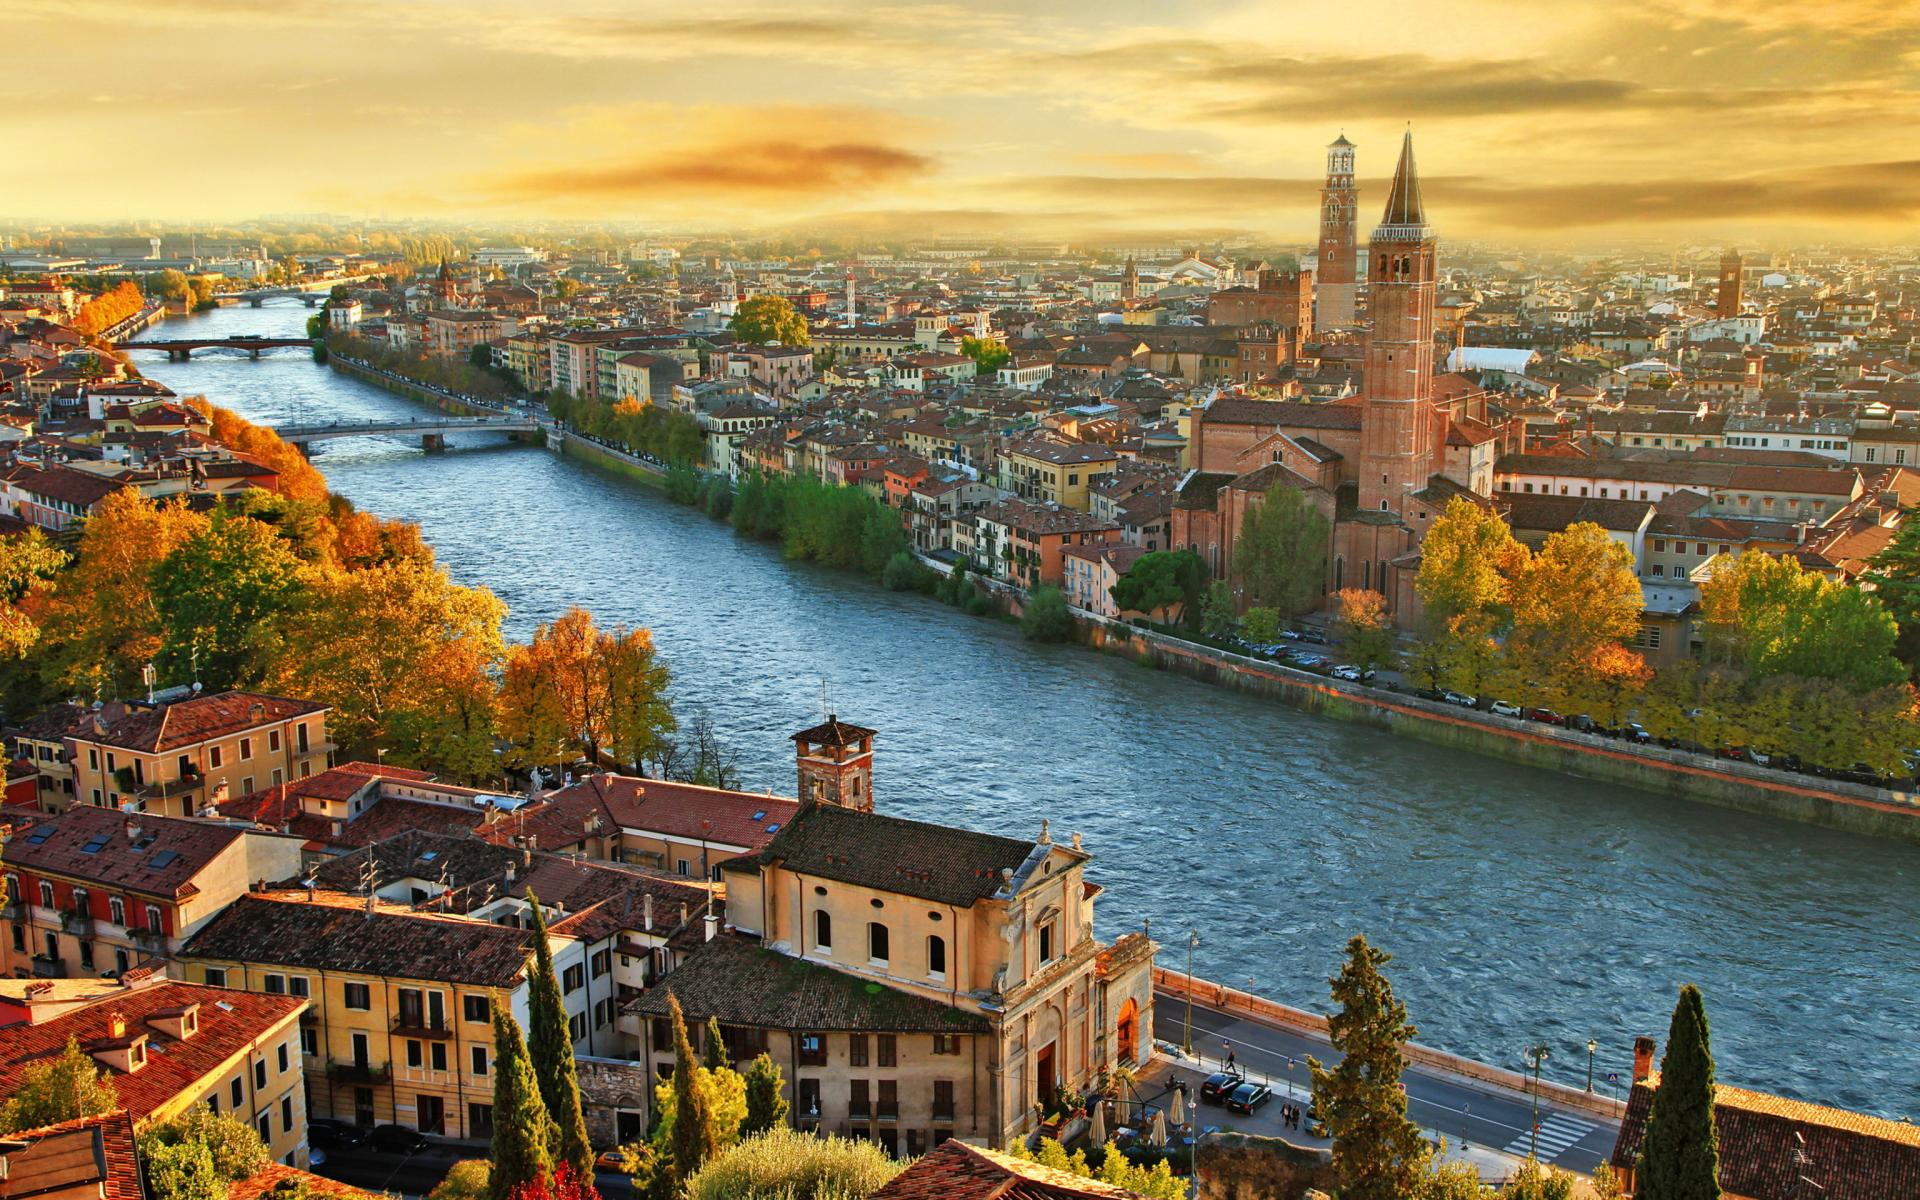 Italy City para Widescreen Desktop PC 1920x1080 Full HD